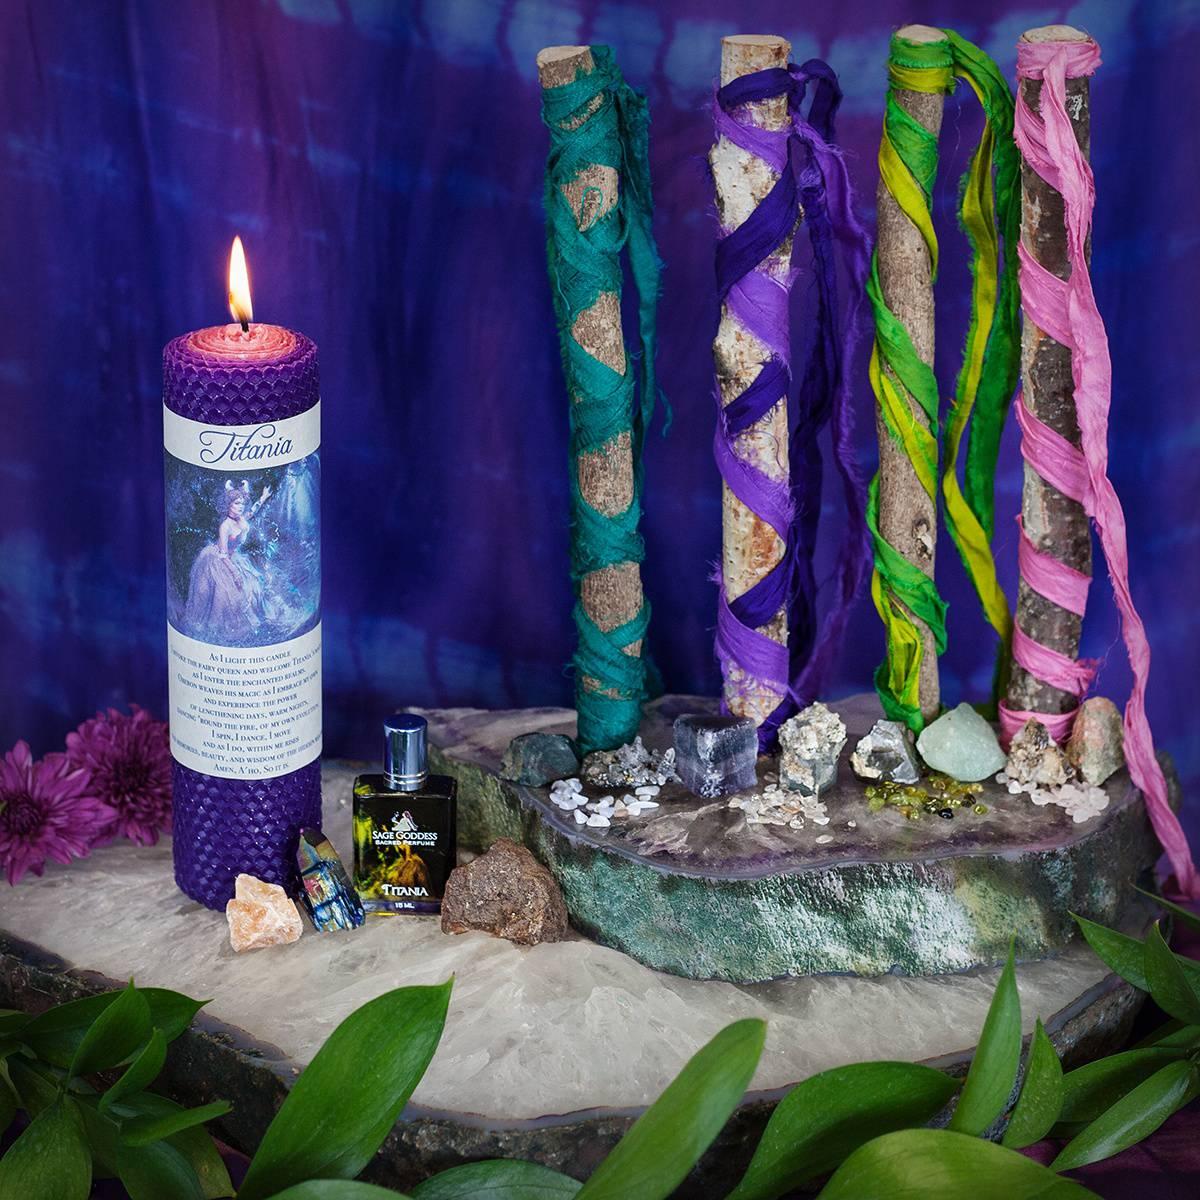 Midsummer Night's Dream - A Solstice Celebration Public Ritual DD 5_1 Featured